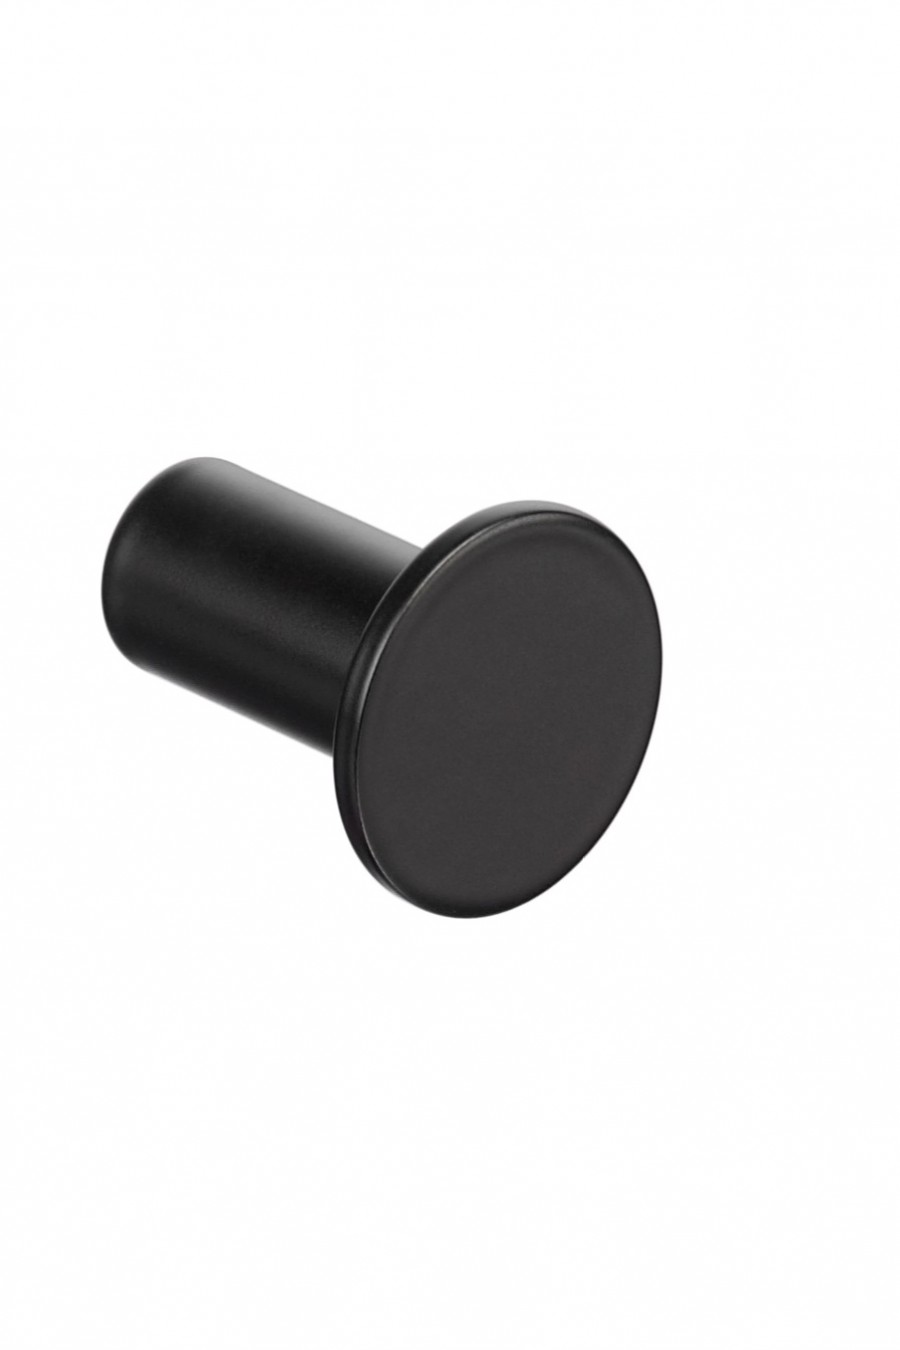 OMICRON BLACK